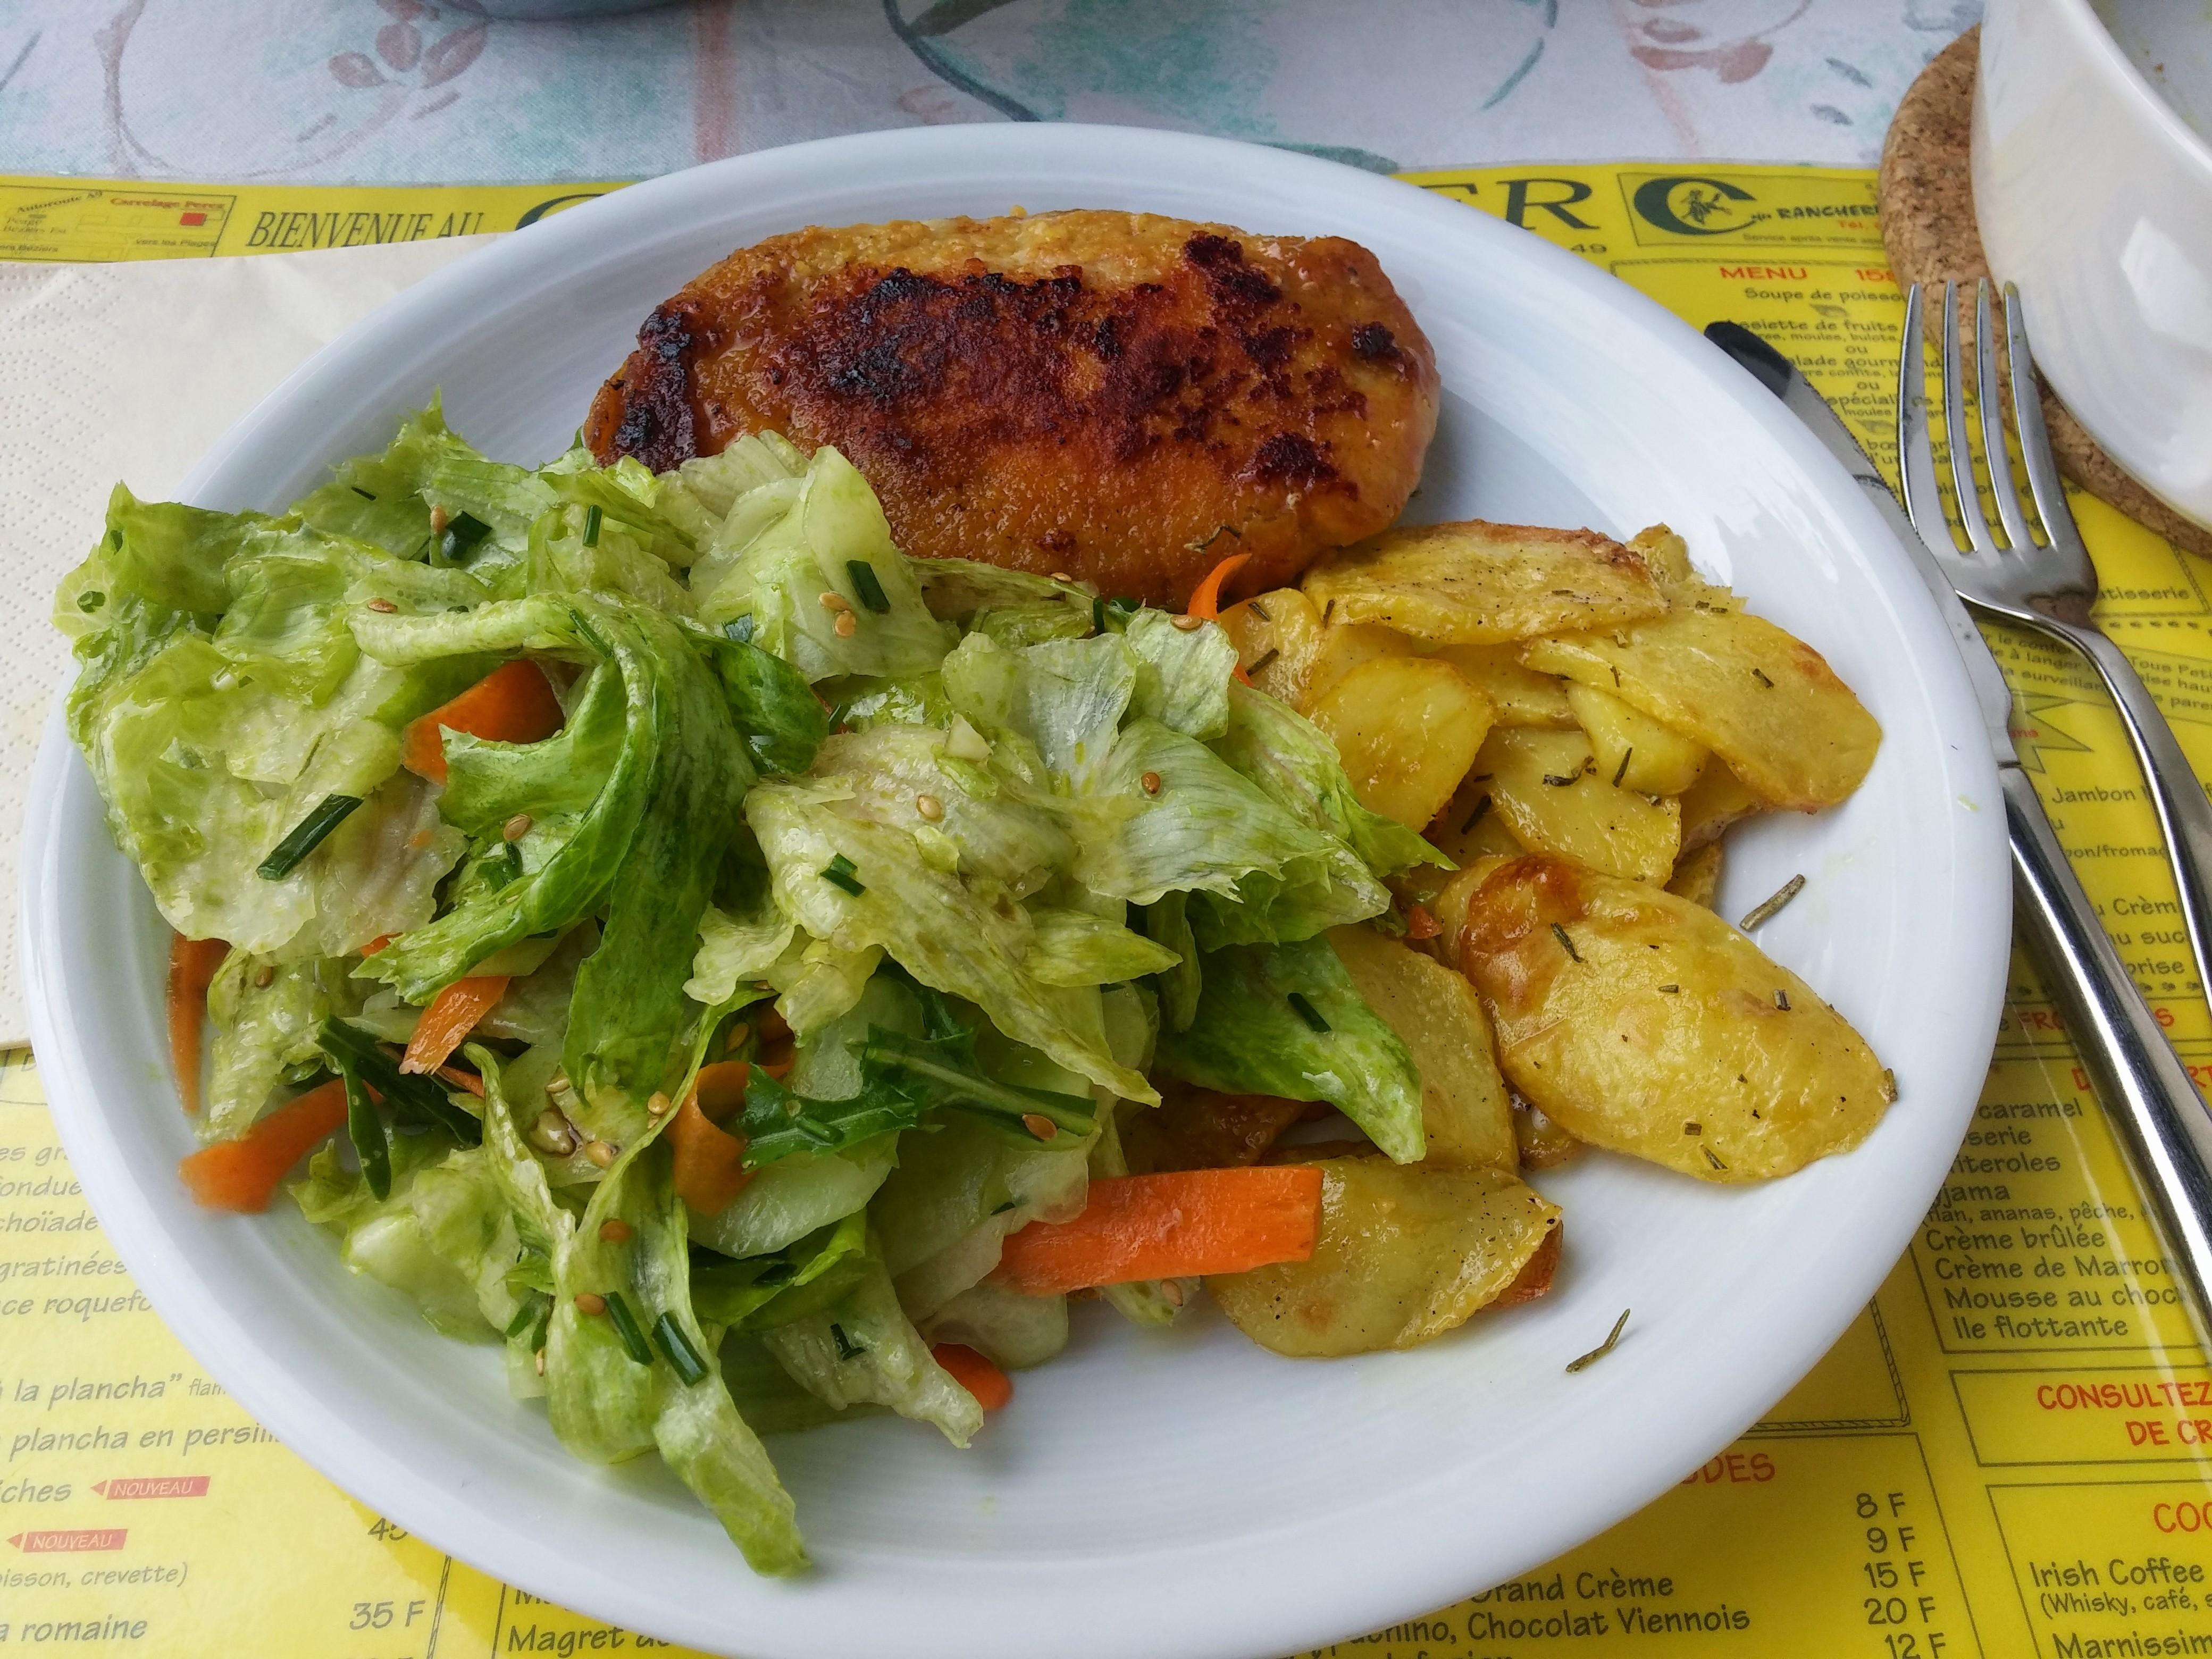 http://foodloader.net/nico_2015-08-09_cordon-bleu-mit-bratkartoffeln-und-salat.jpg